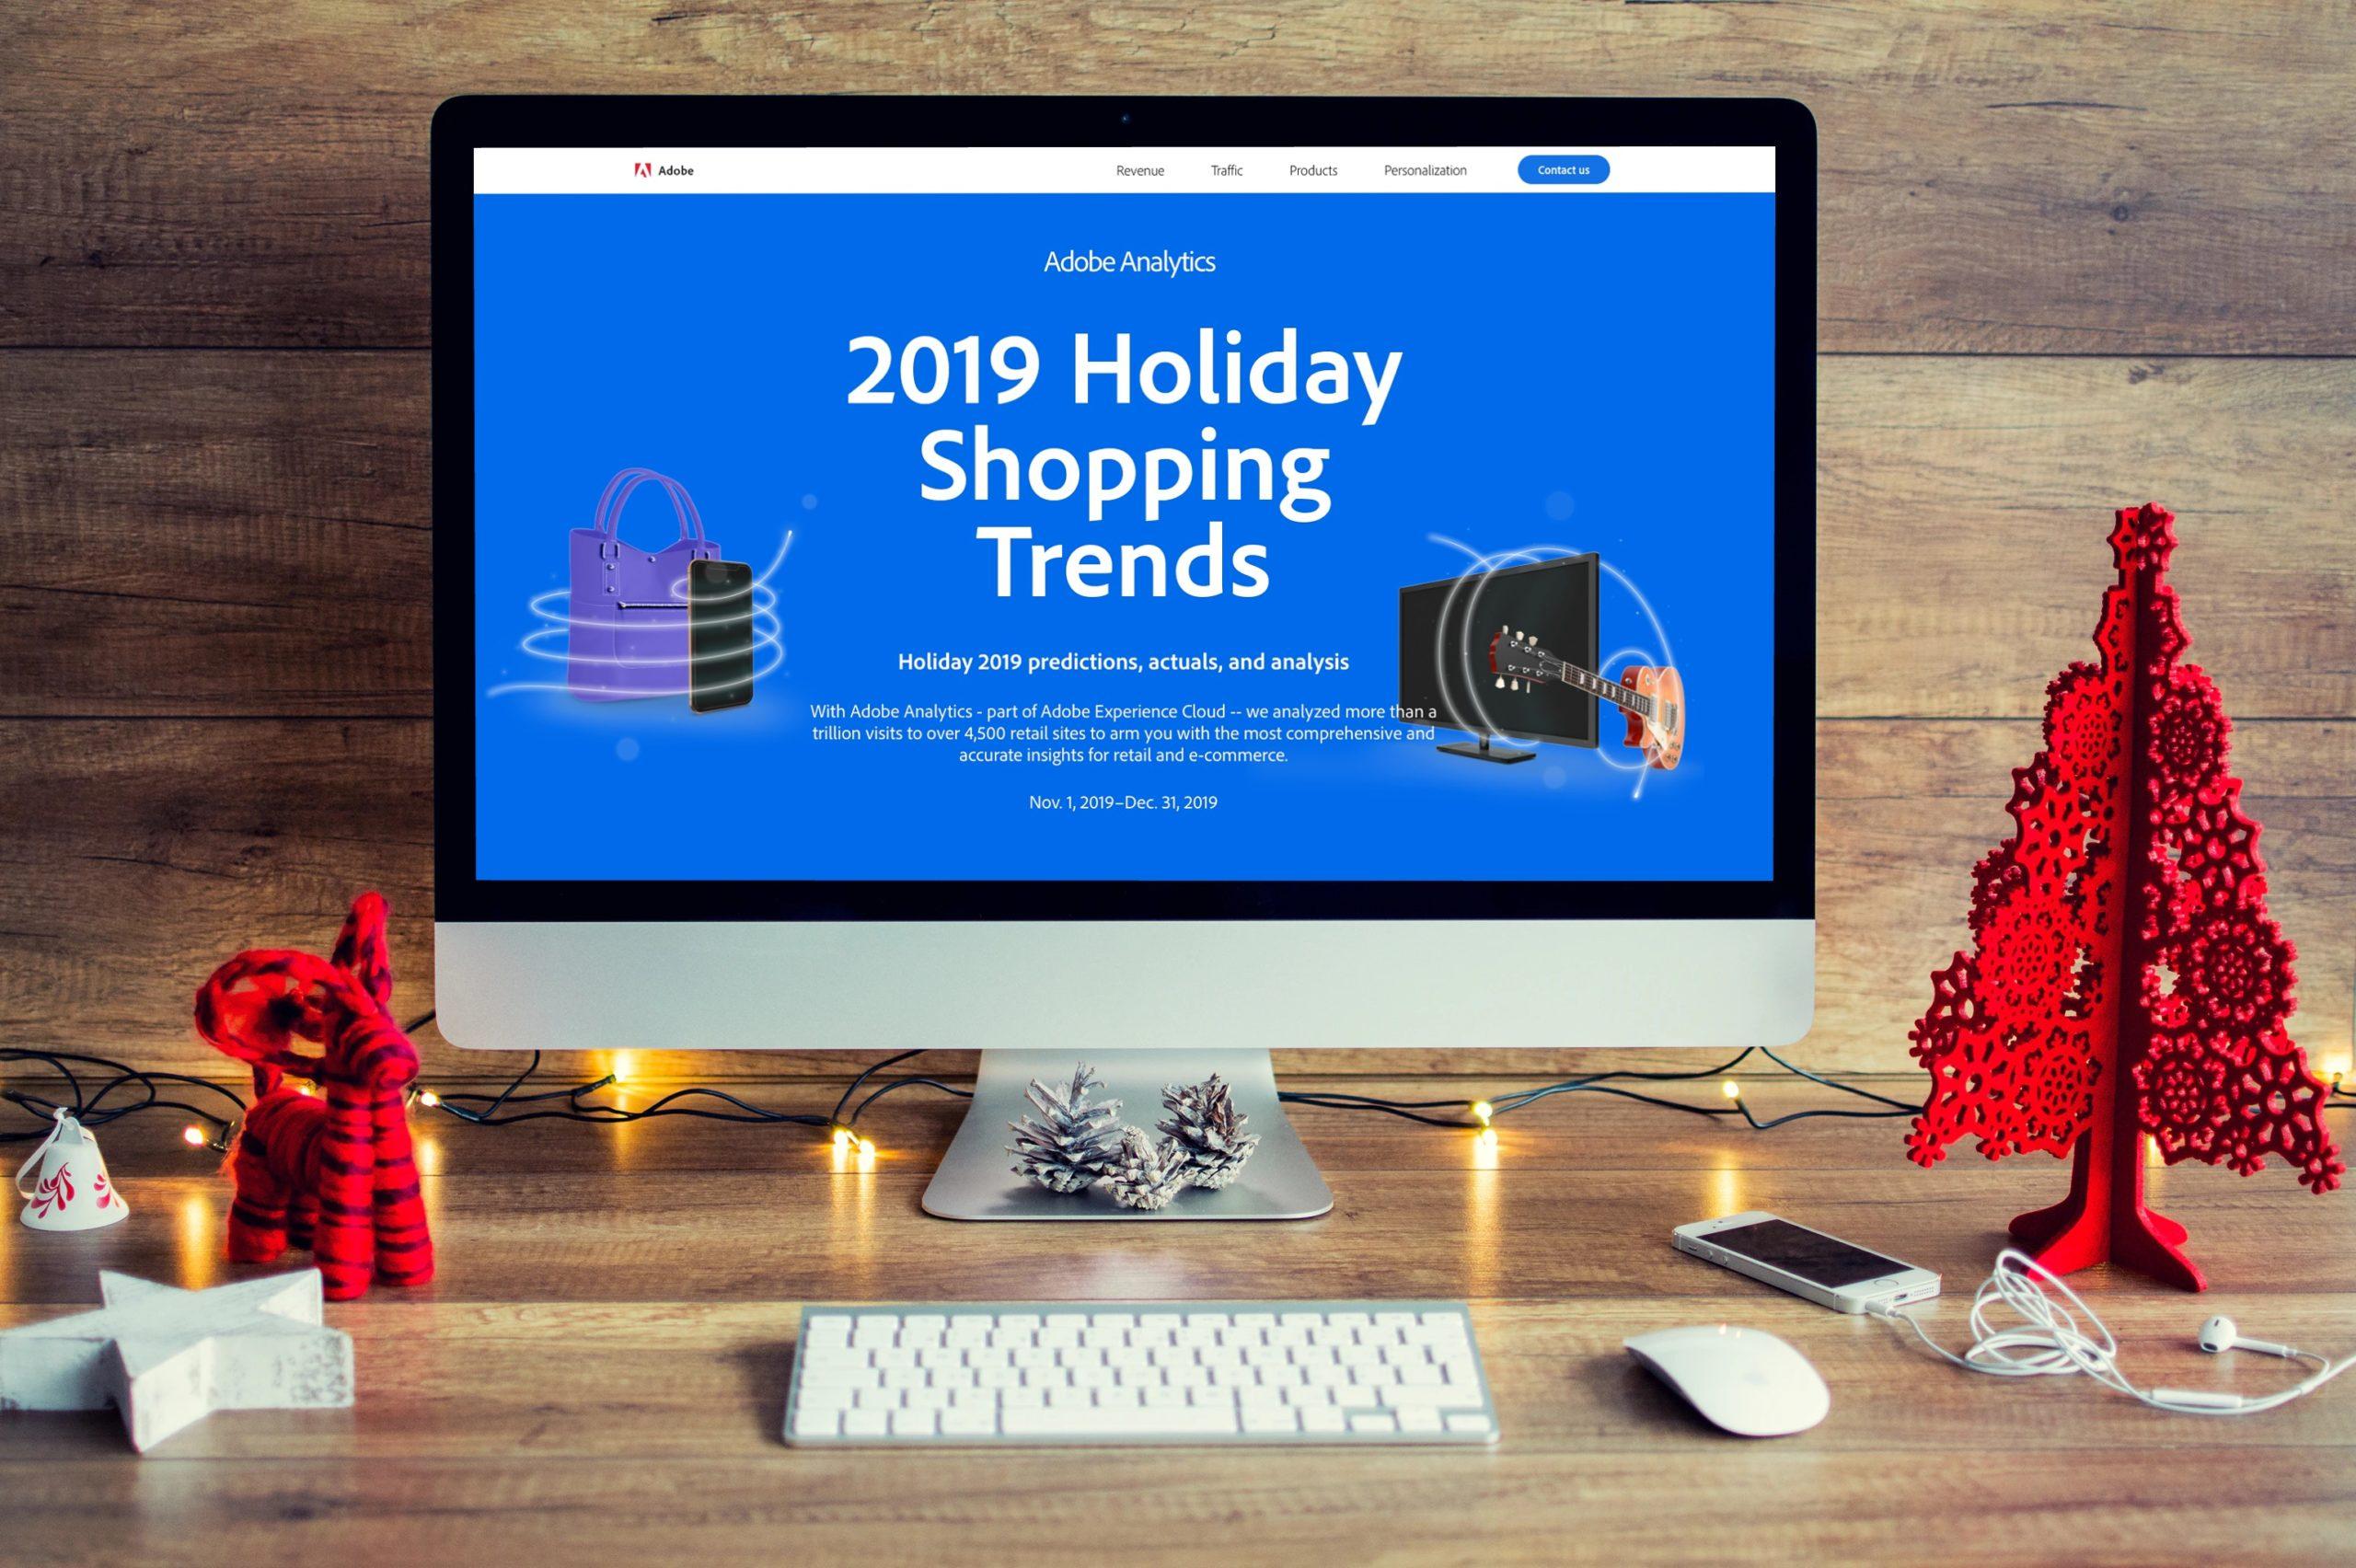 Adobe_Holiday_Media_Relations